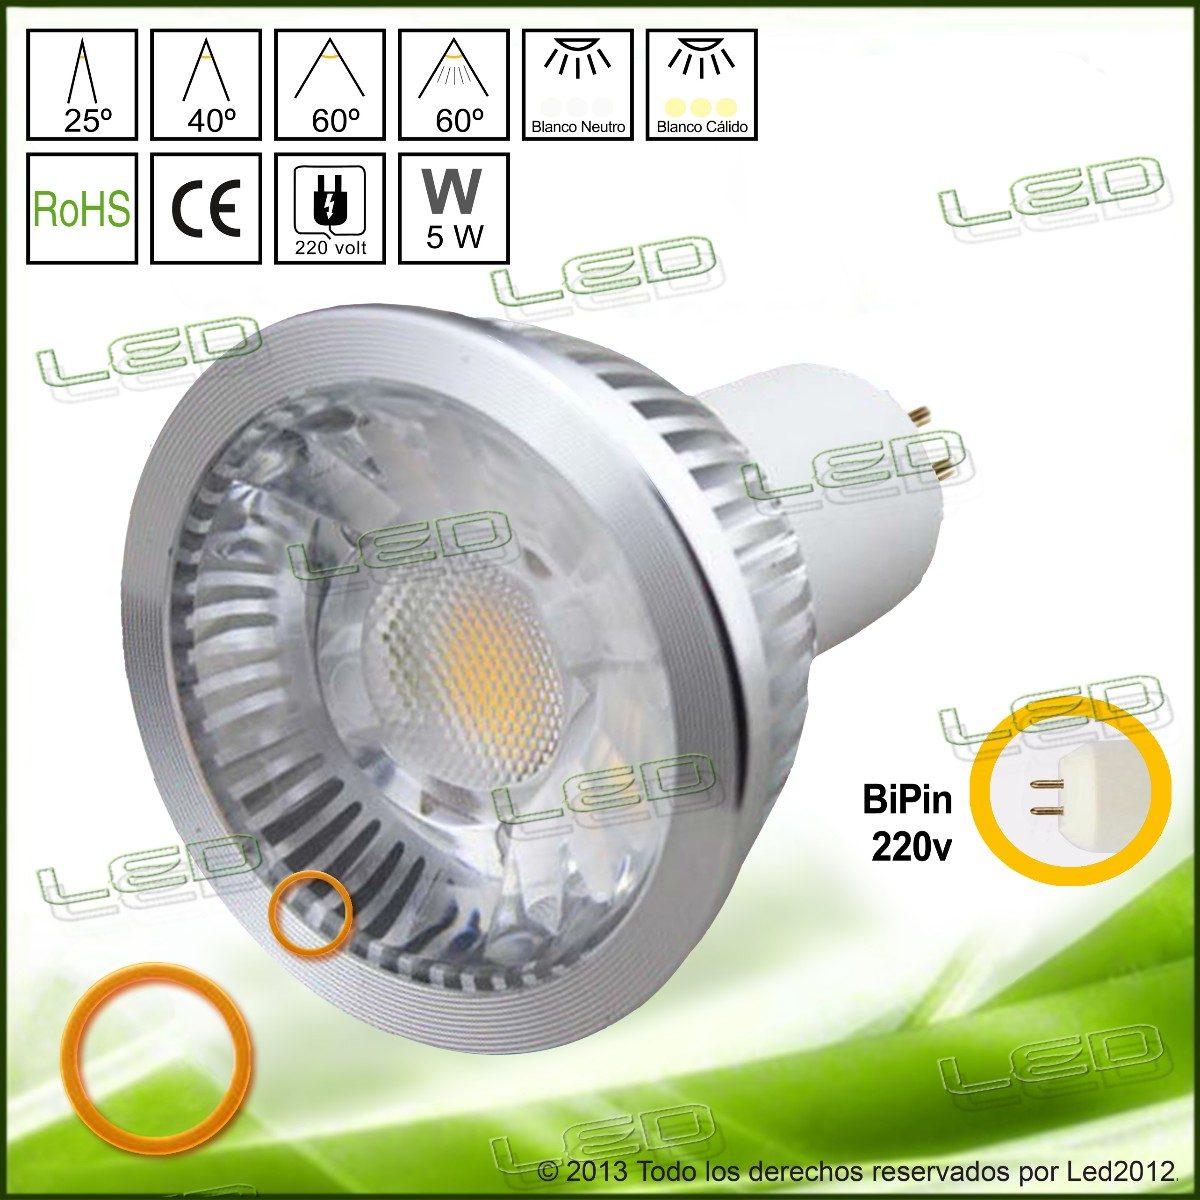 Lámpara Led Volt Dicroica 220 Alta Luminosidad 5 Watt 600lm yvbfgmIY76